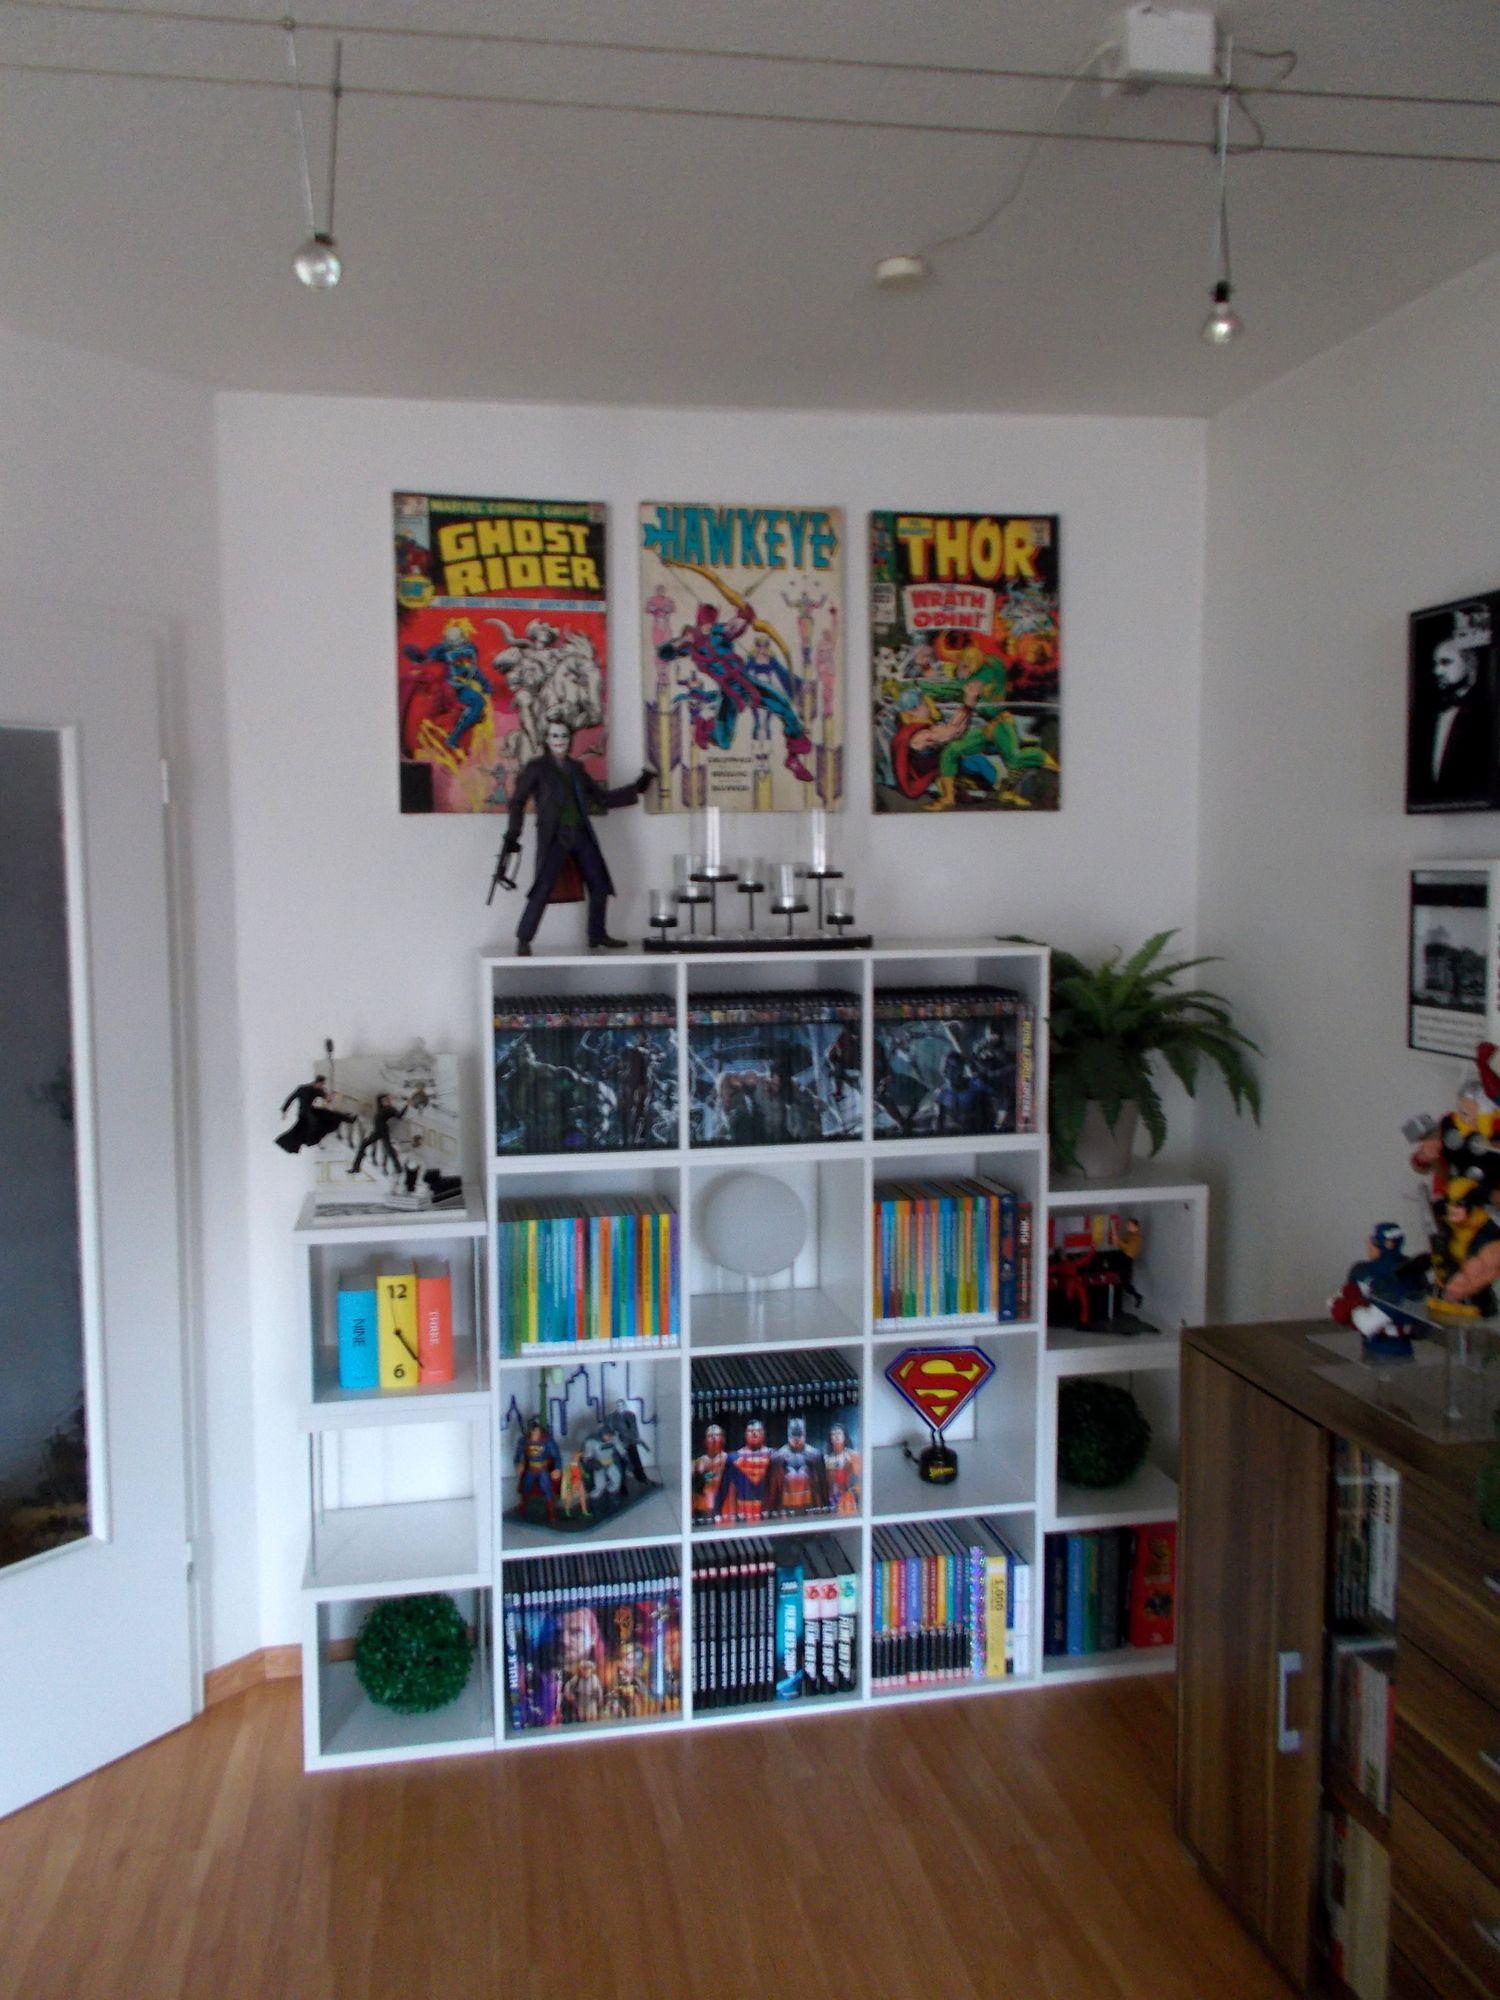 Https Www2 Pic Upload De Img 34276542 Dscn0090 Jpg First Apartment Decorating Nerd Bedroom Nerd Decor